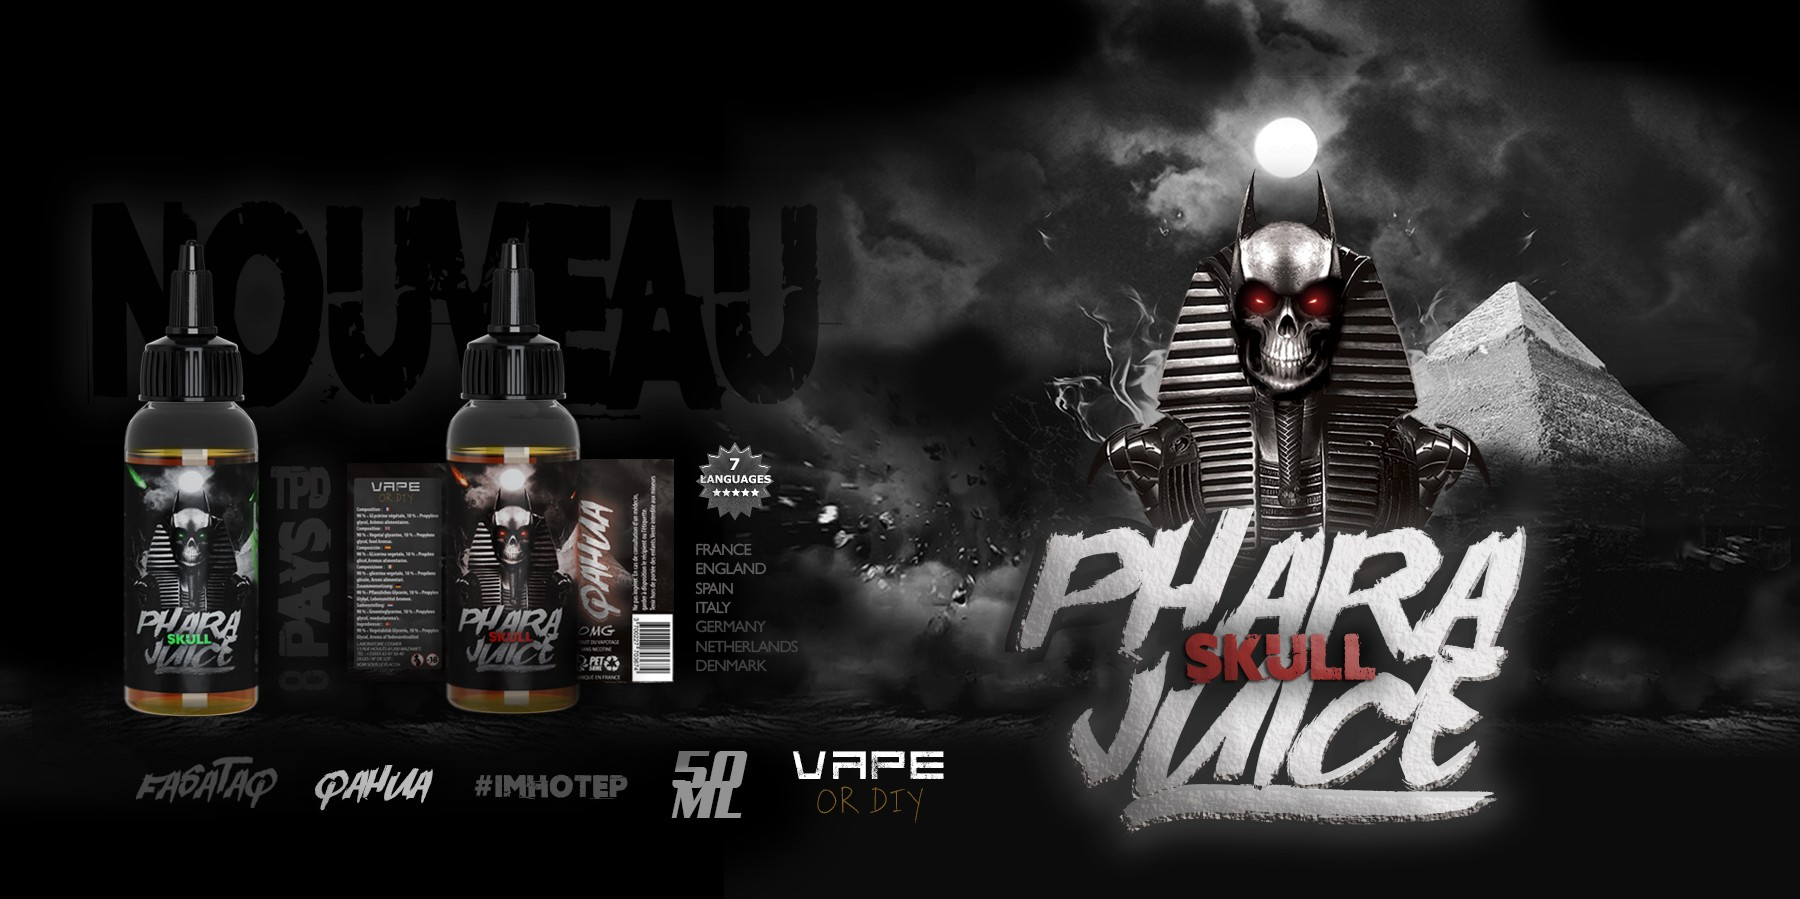 Phara Skull Juice